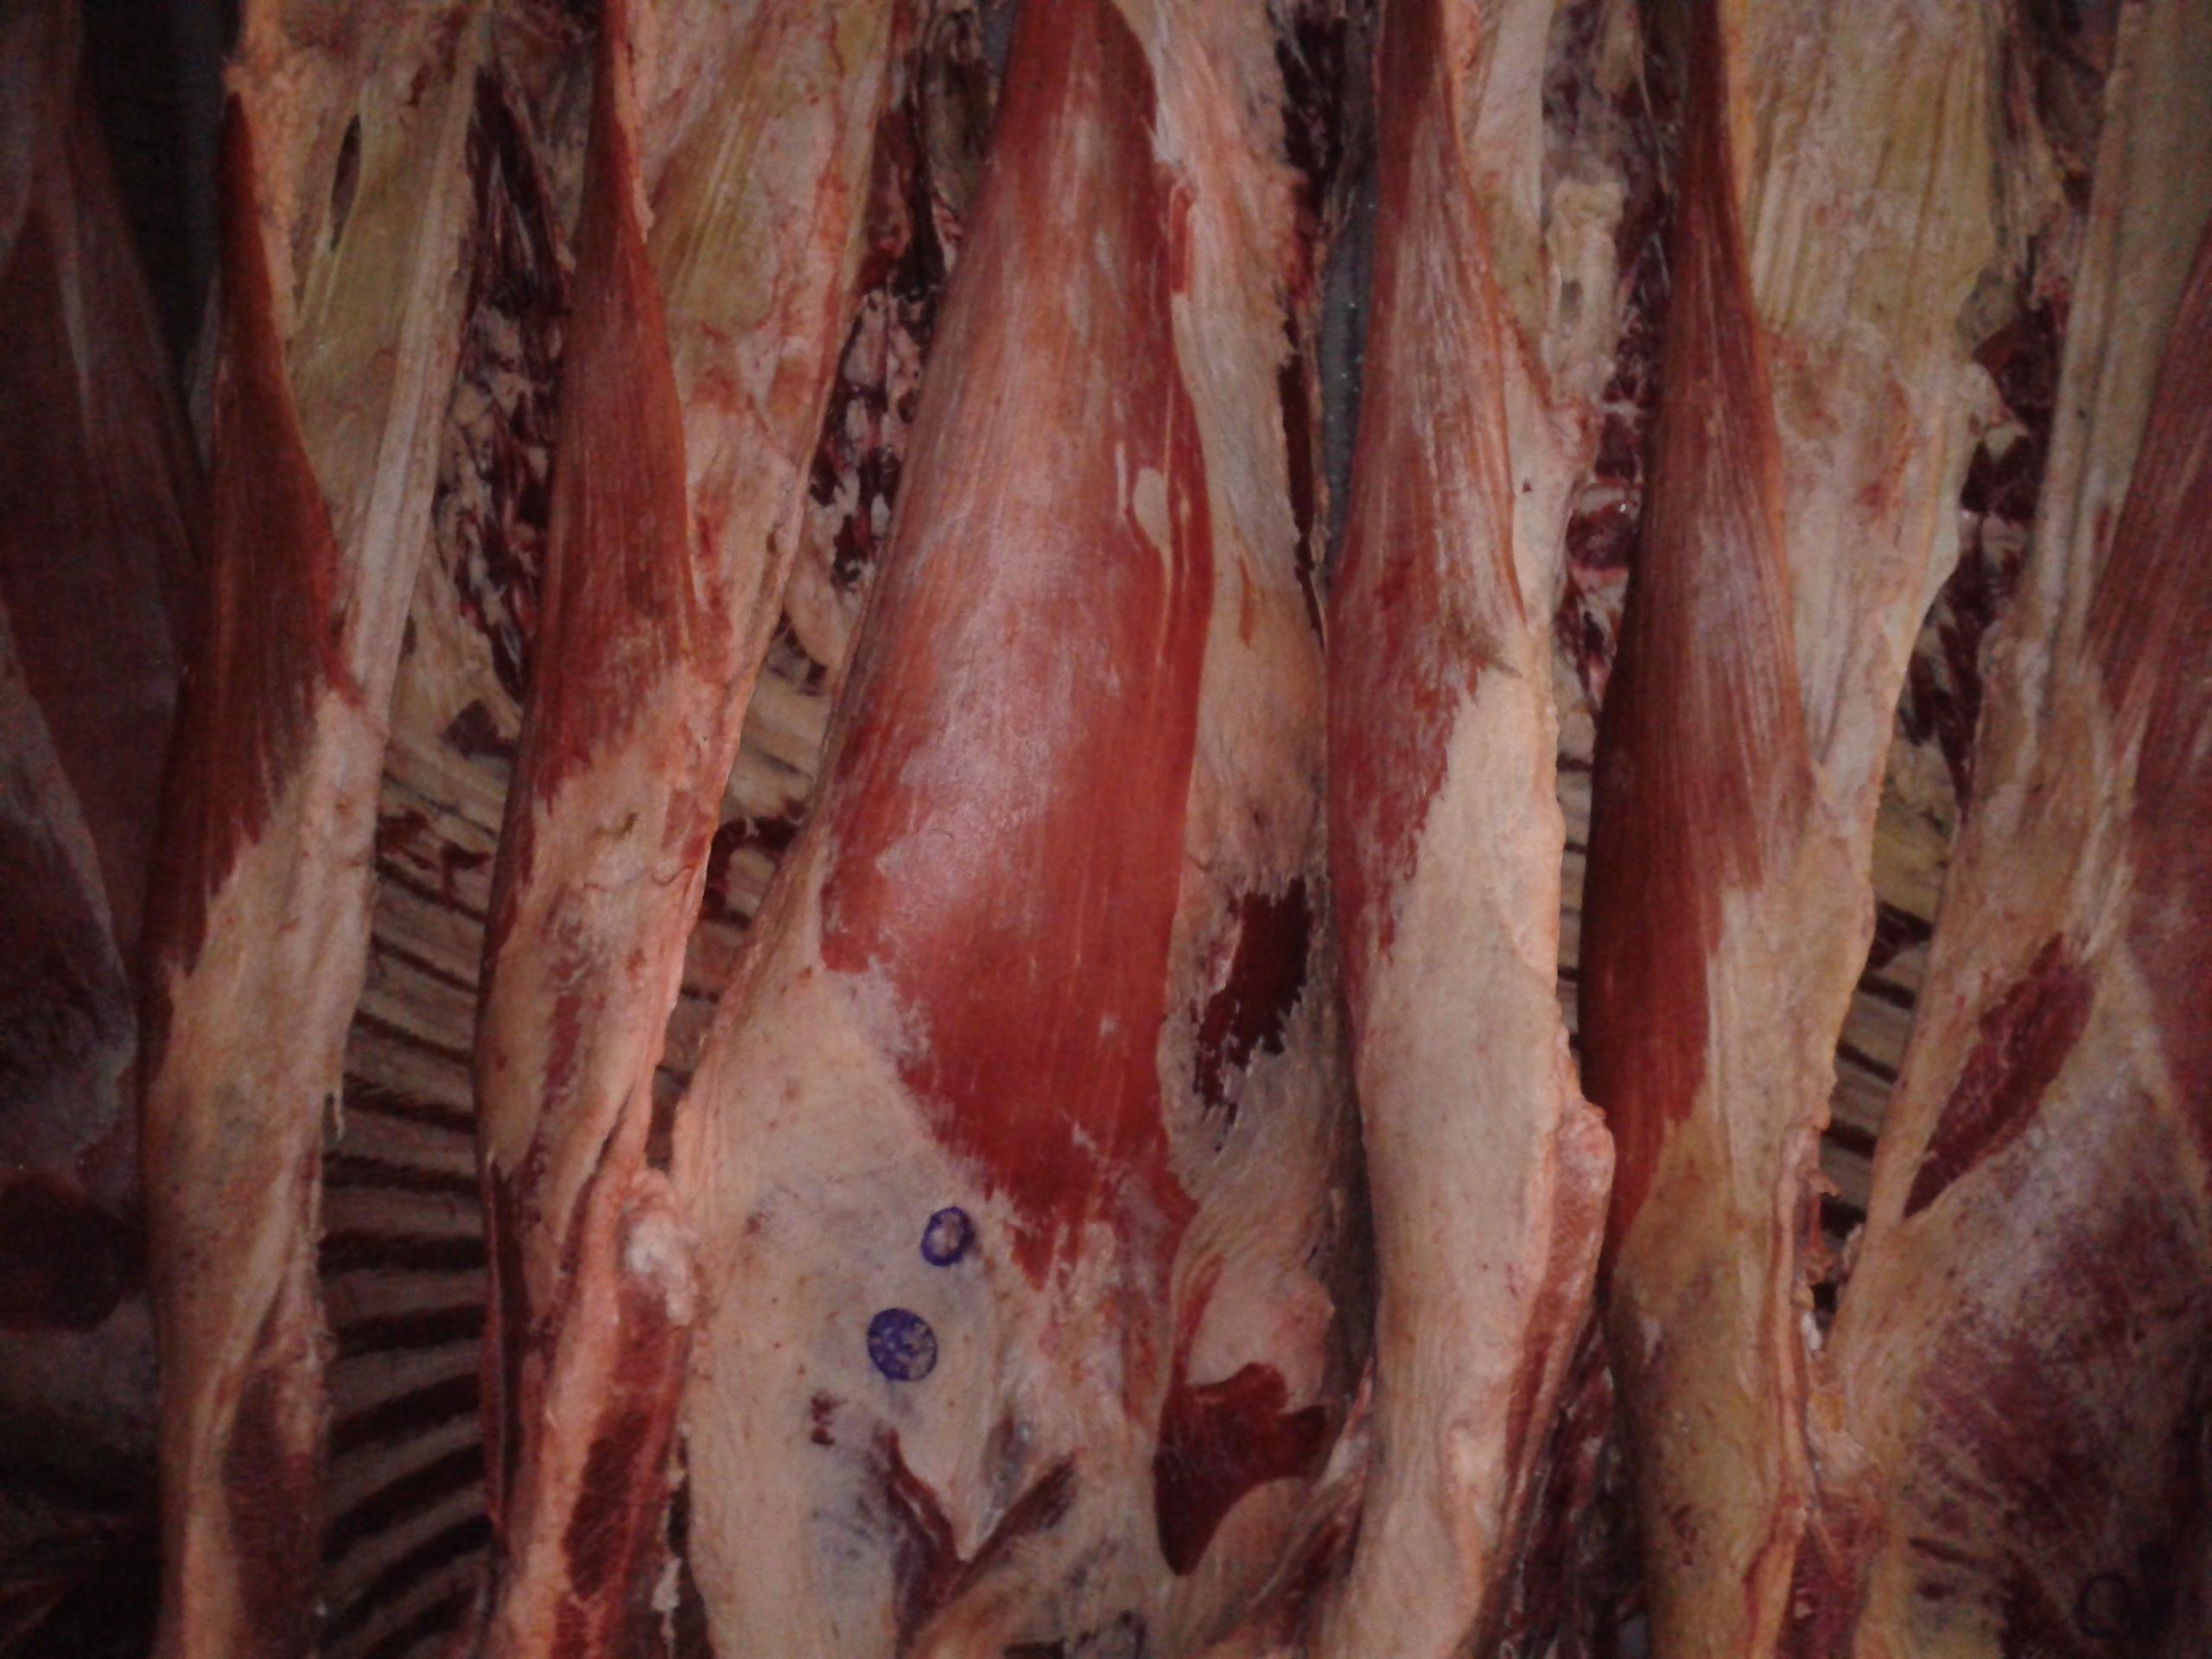 дешёвая говядина и свинина